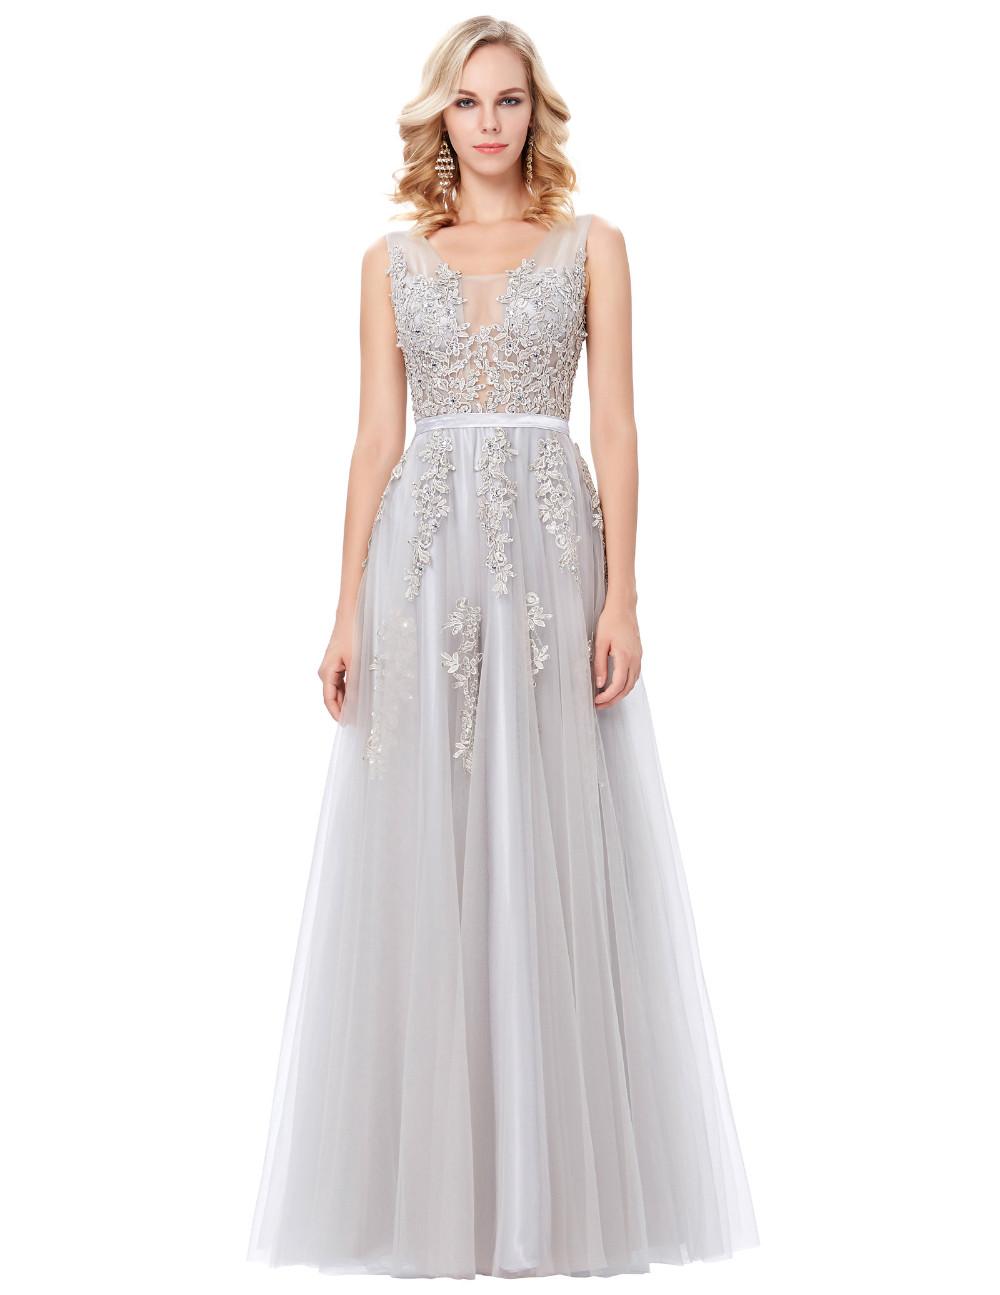 Grace Karin Tulle Appliques Celebrity Prom Dress Sexy V Back Sleeveless Long Royal Blue Robes De Soiree 2017 Longue Prom Dresses 17